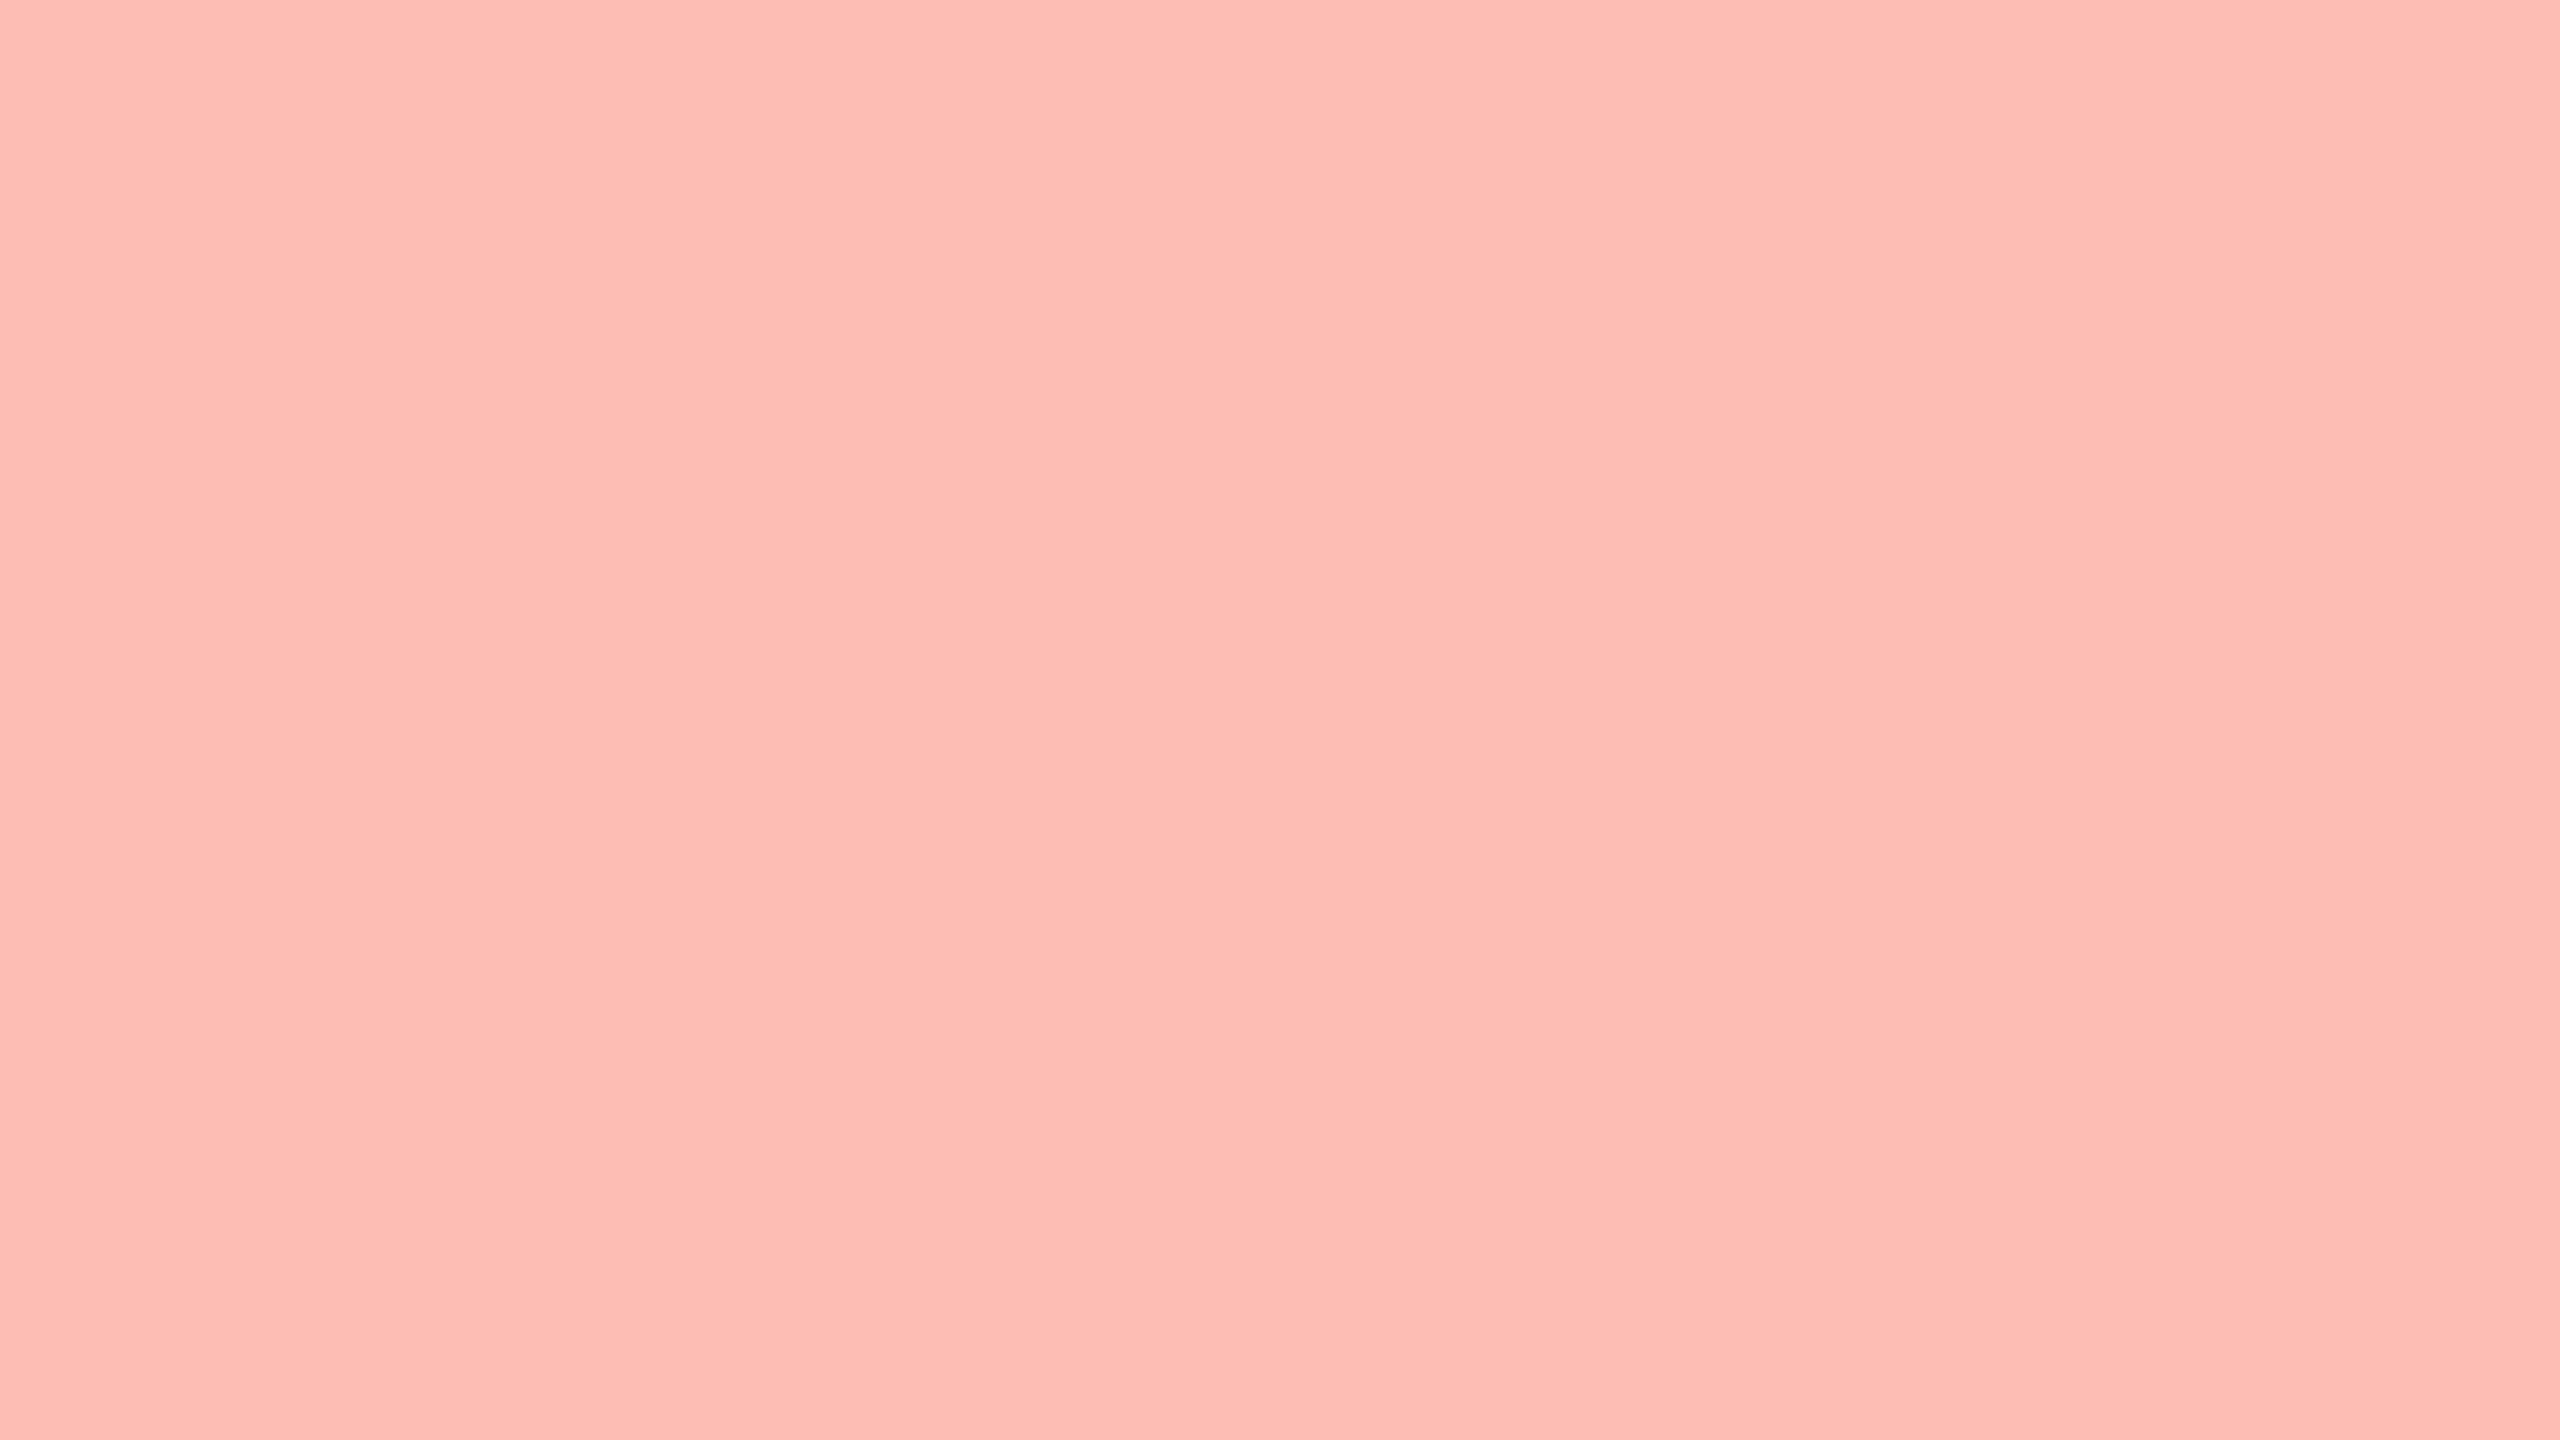 Solid color background pics - Color rosa palo ...